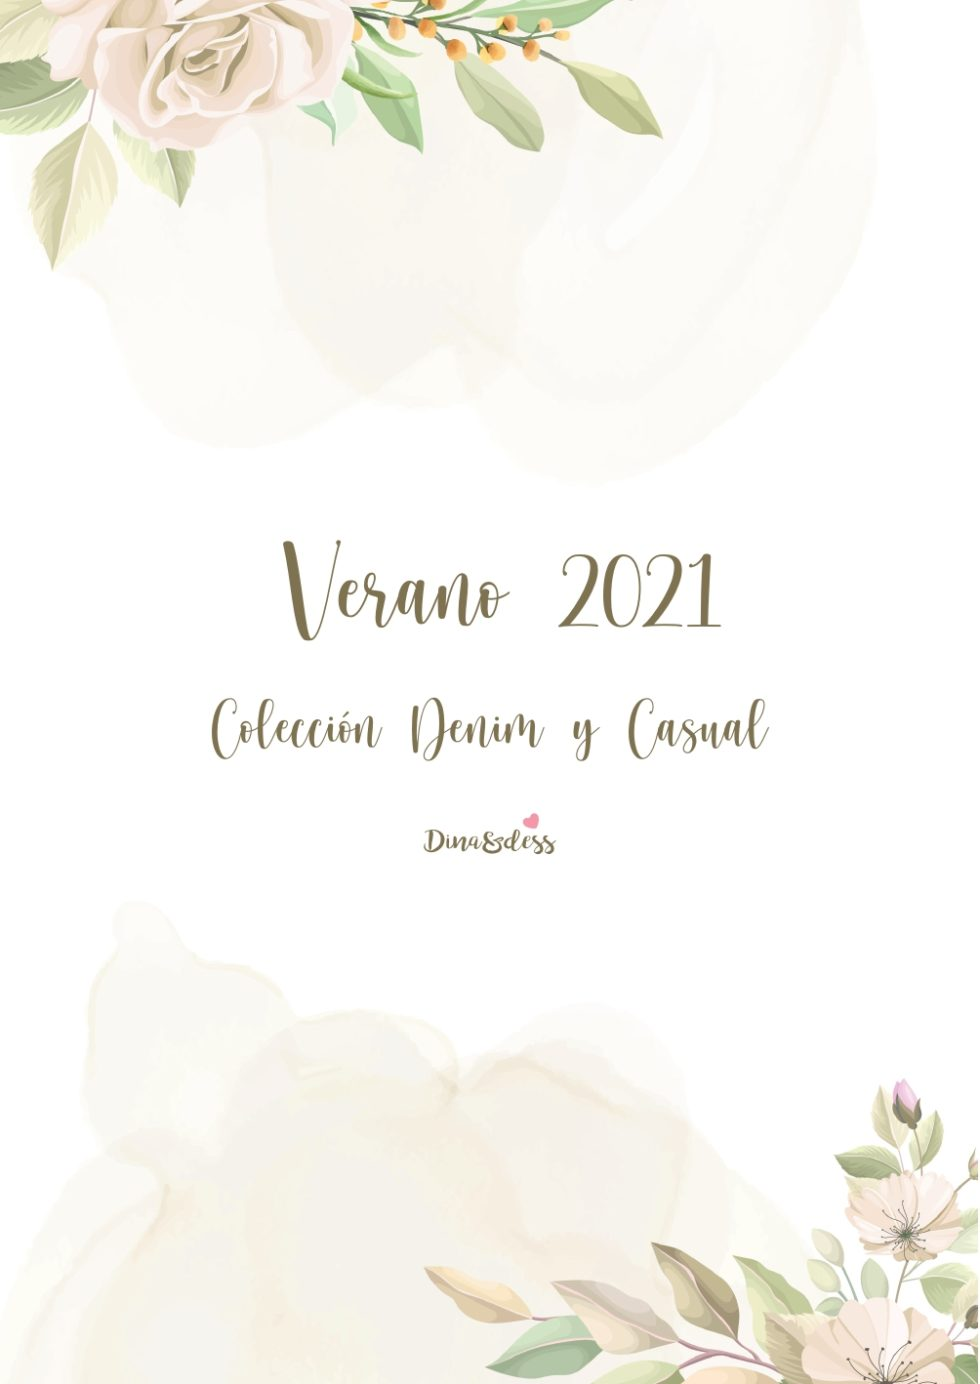 Verano 2021 Dina&Dess Clientes_page-0002